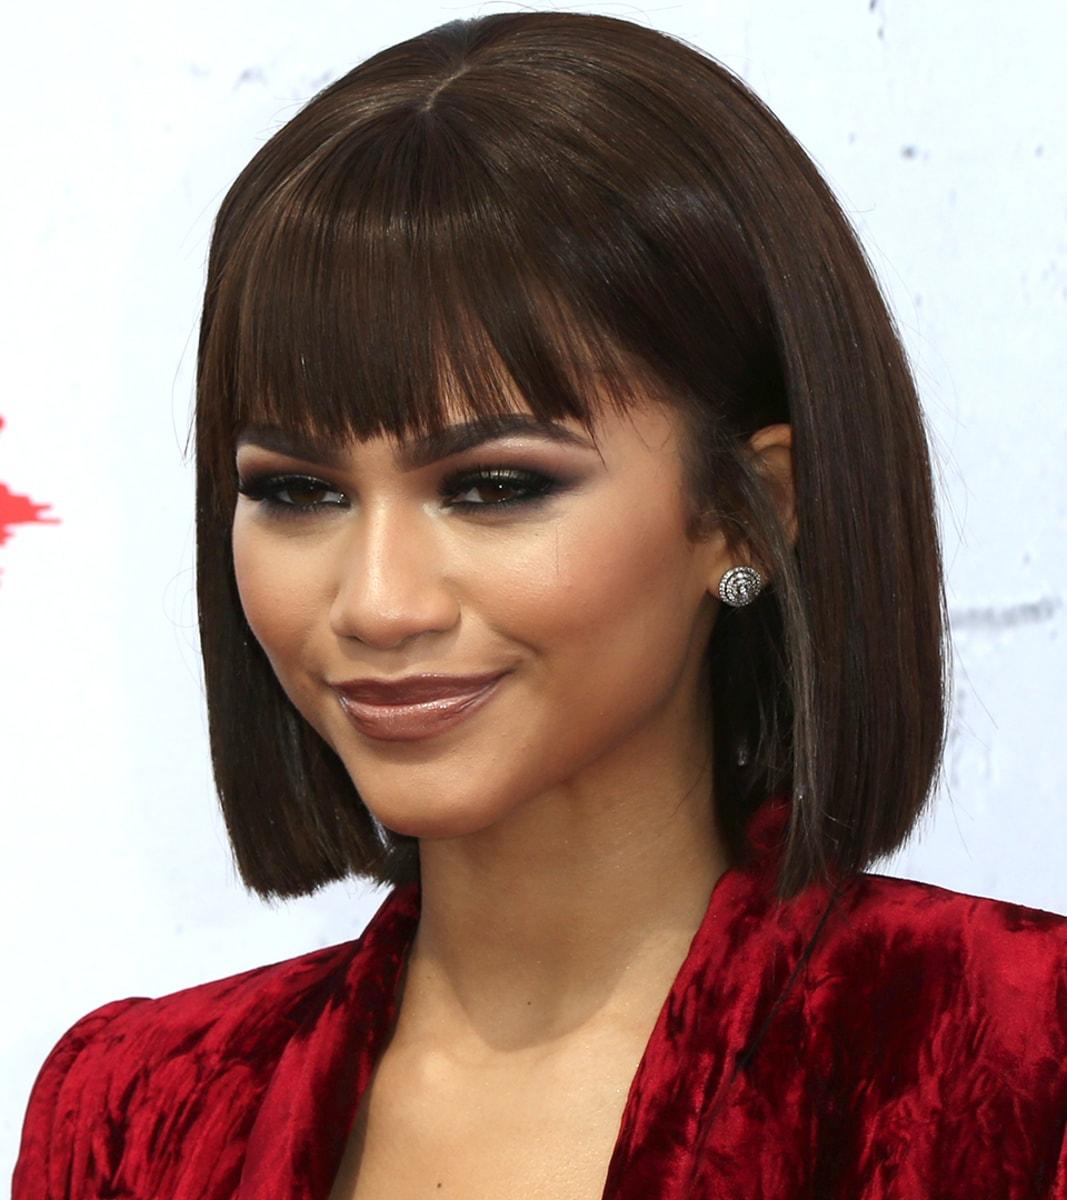 Zendaya Hairstyles : 2016 Celebrity Short Hairstyles with Short Hairstyles Auburn Hair also ...